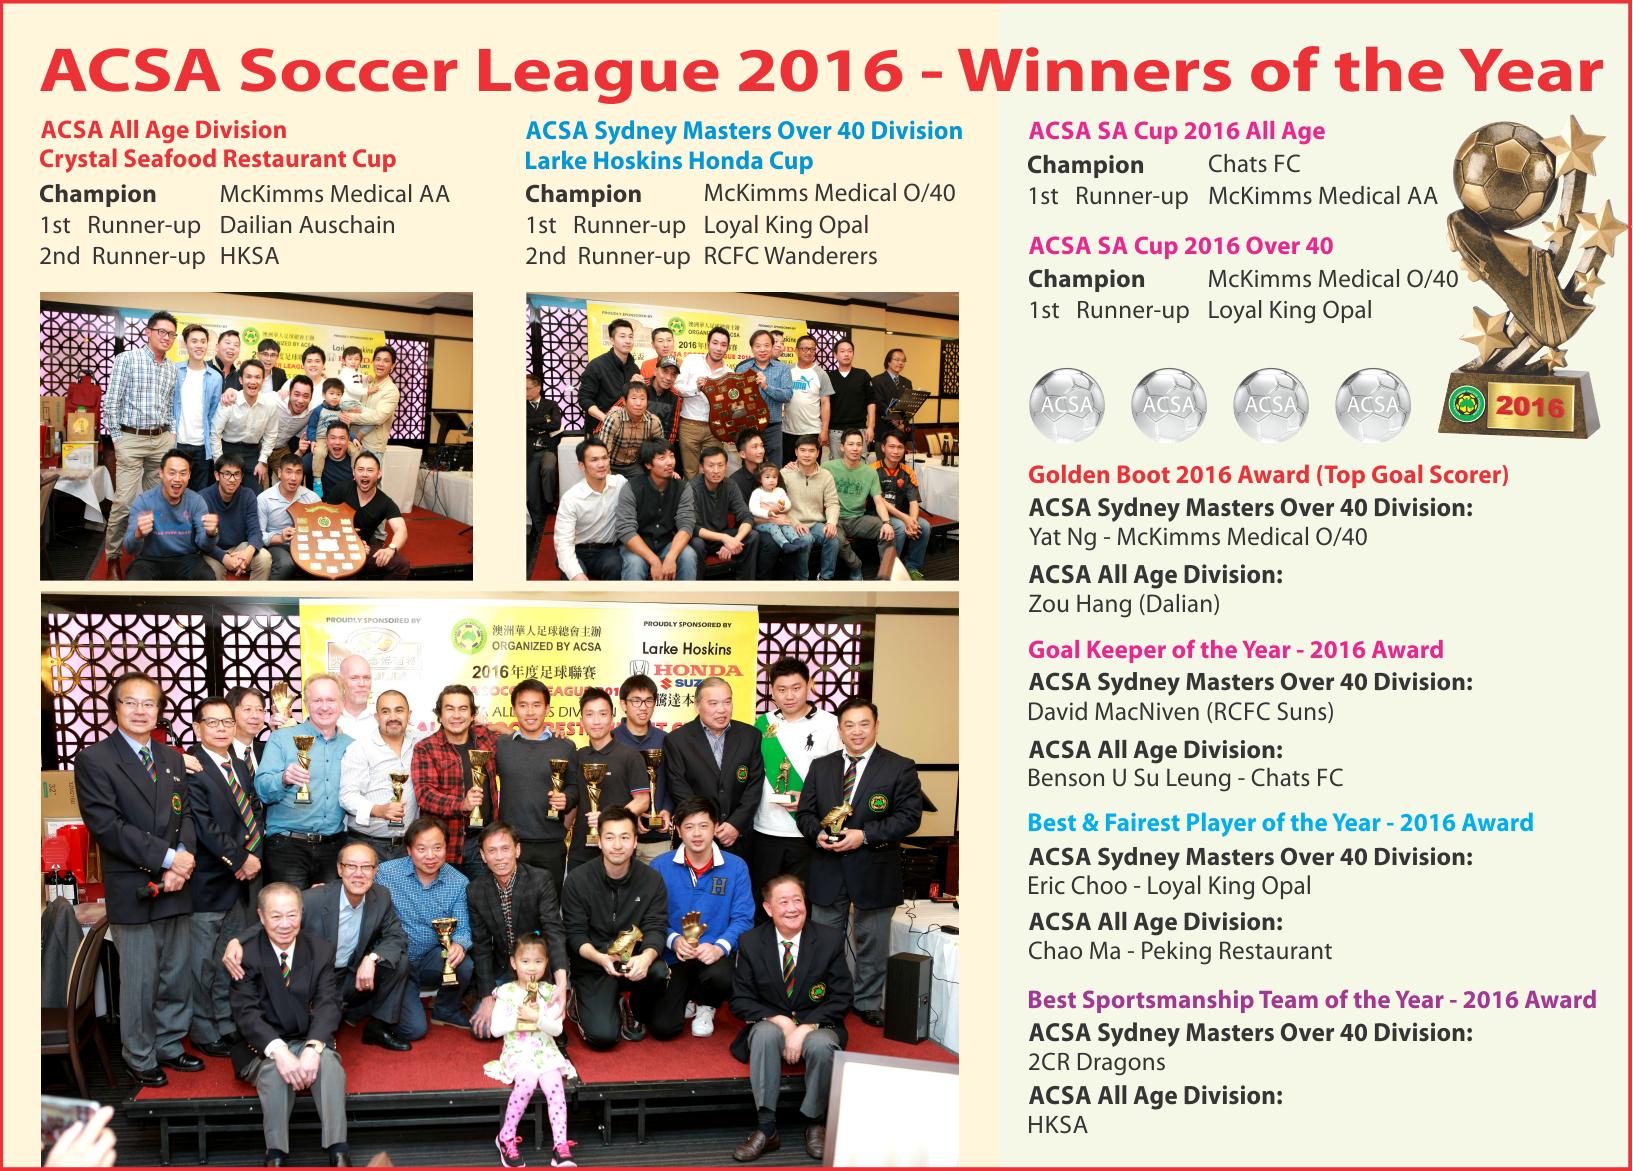 ACSA-Winners-of-the-Year-2106-3